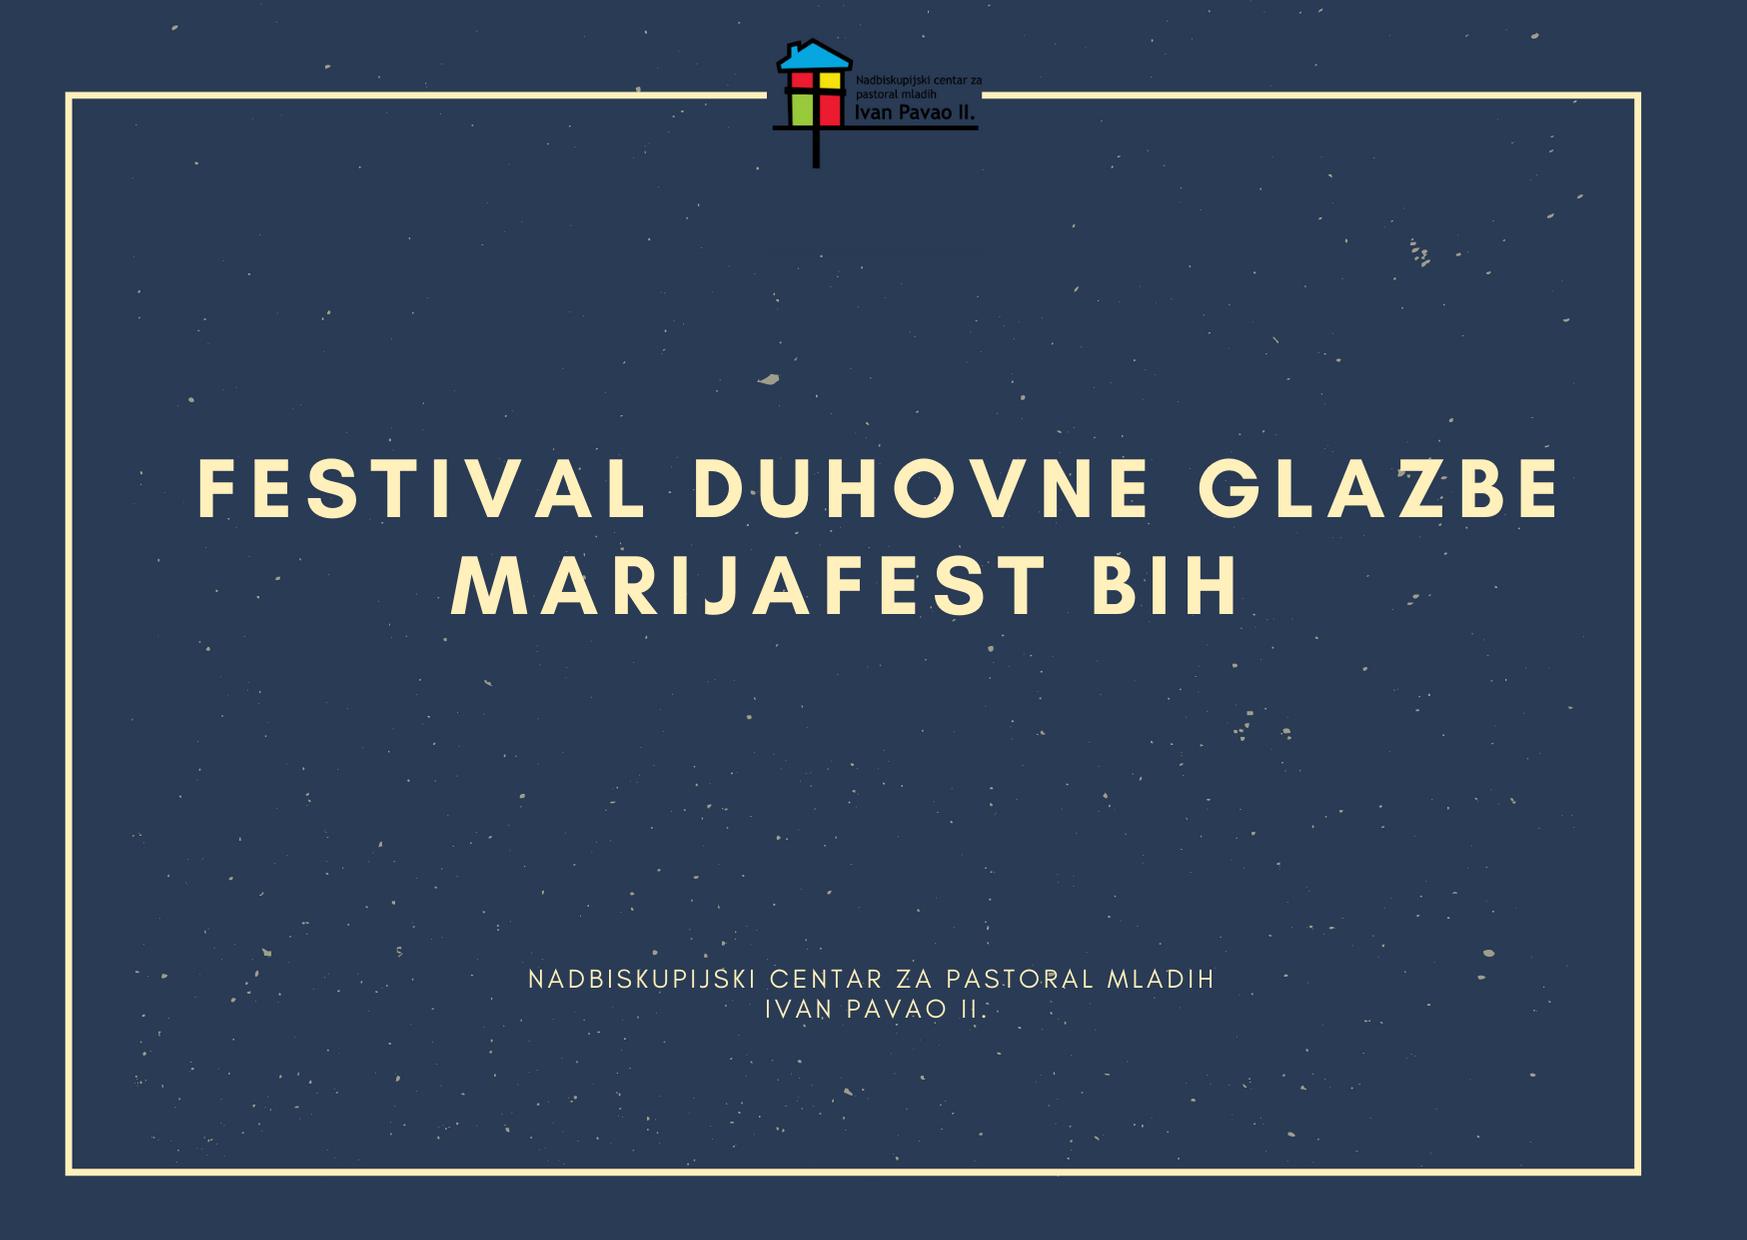 Festival duhovne glazbe Marijafest BiH